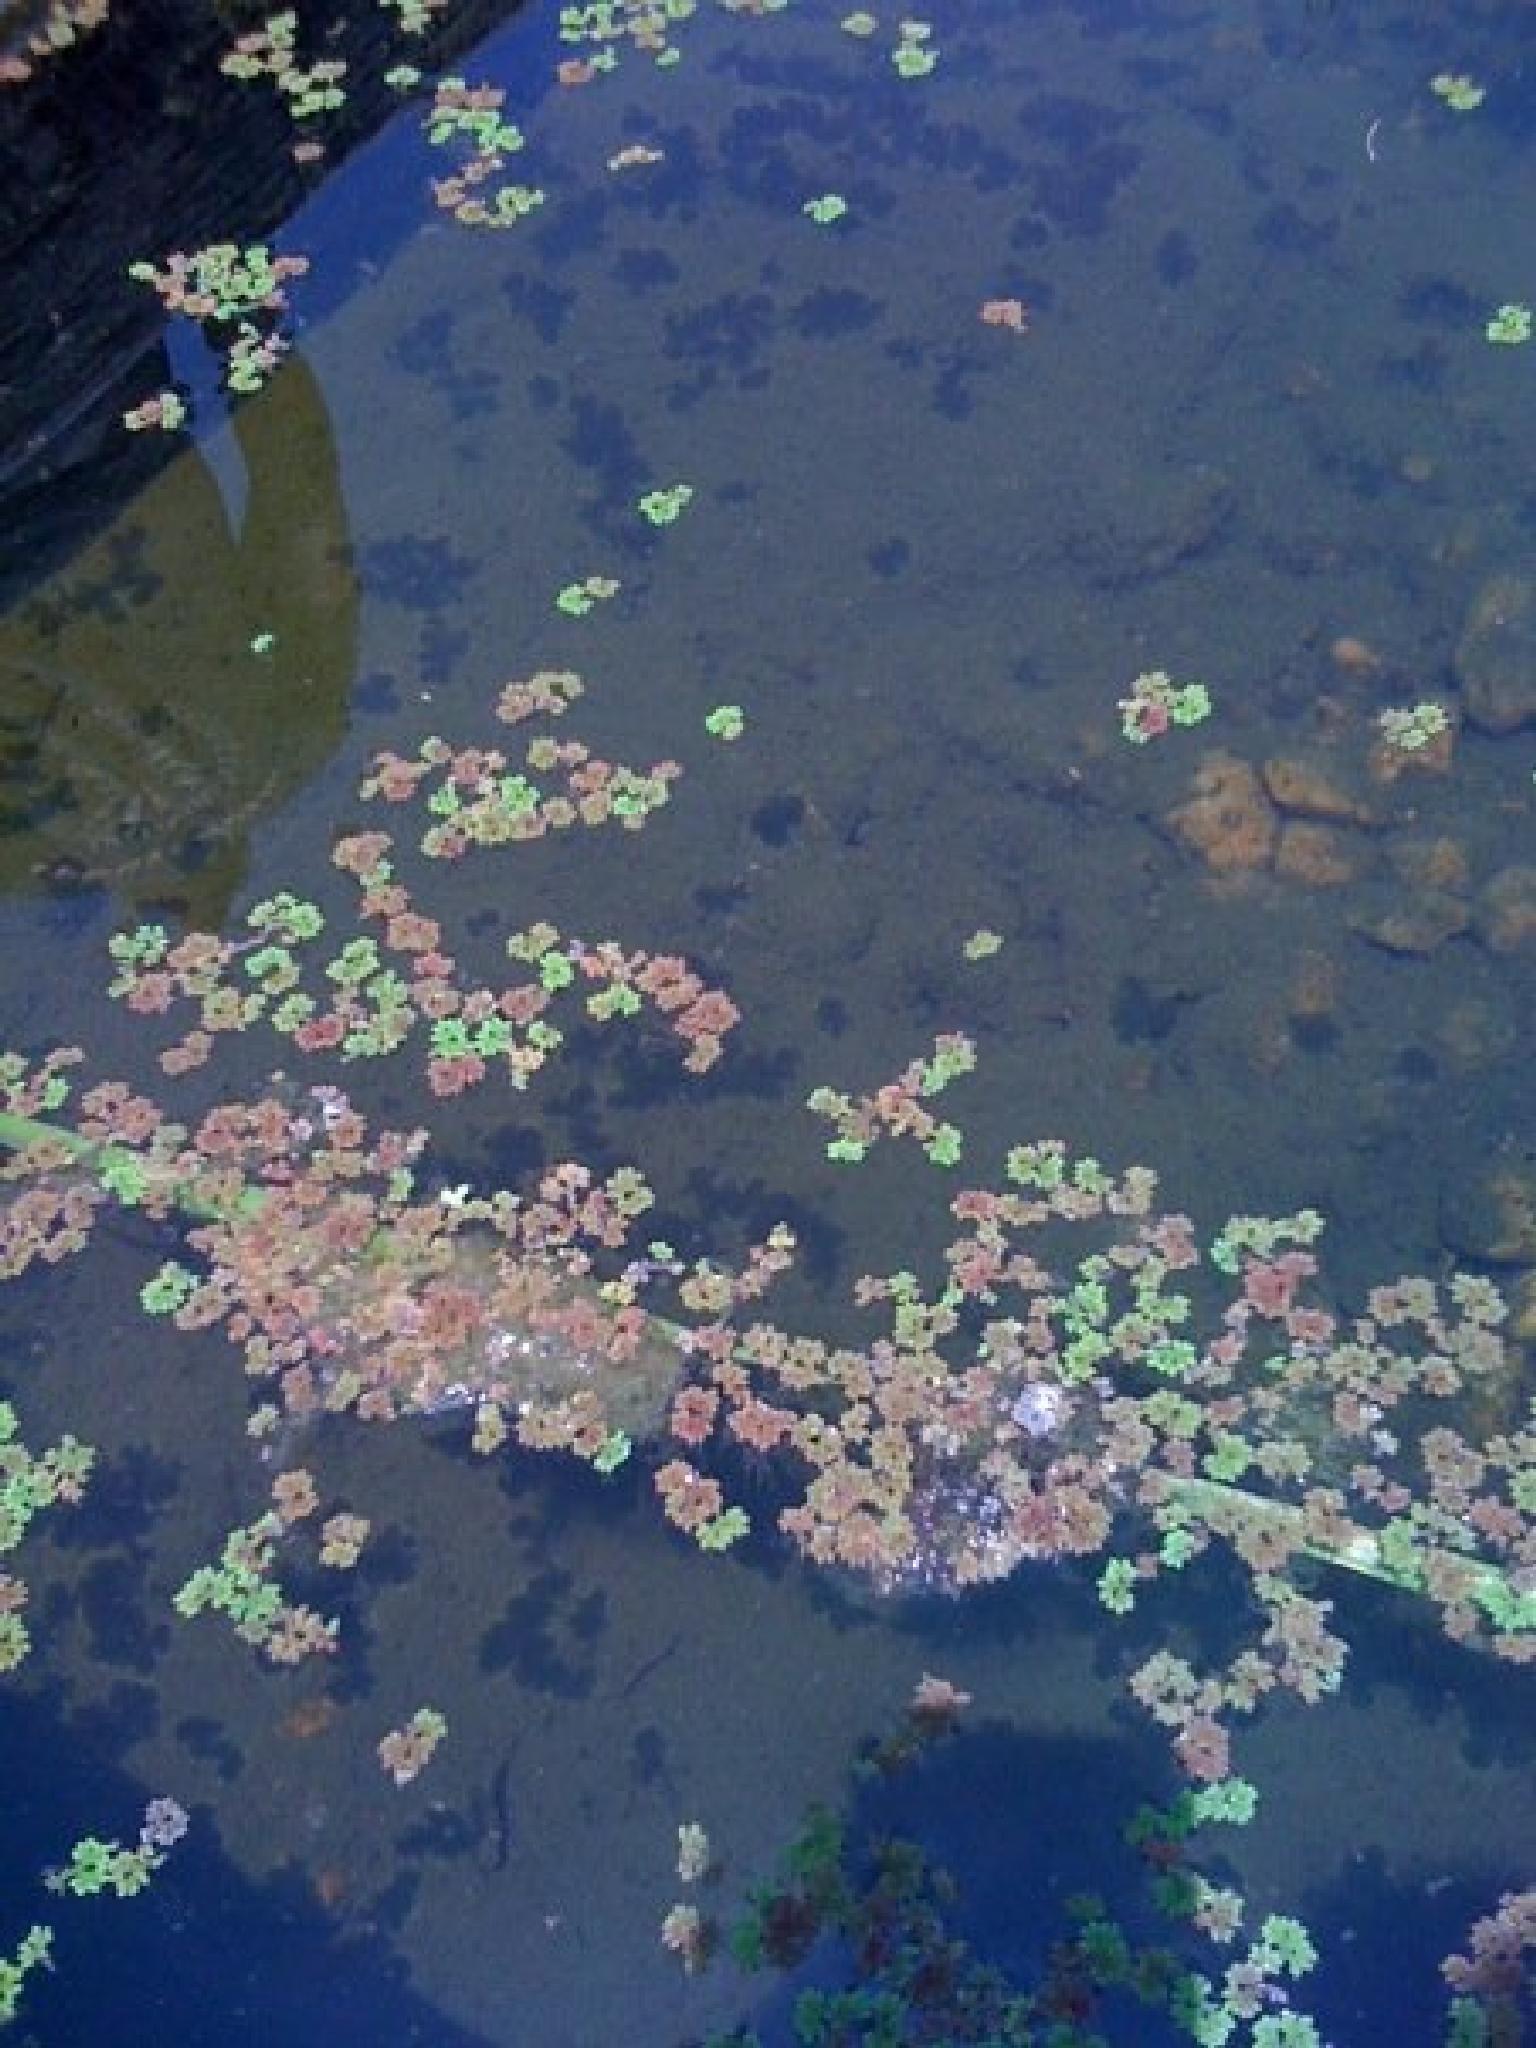 Pond Water by AllySylum